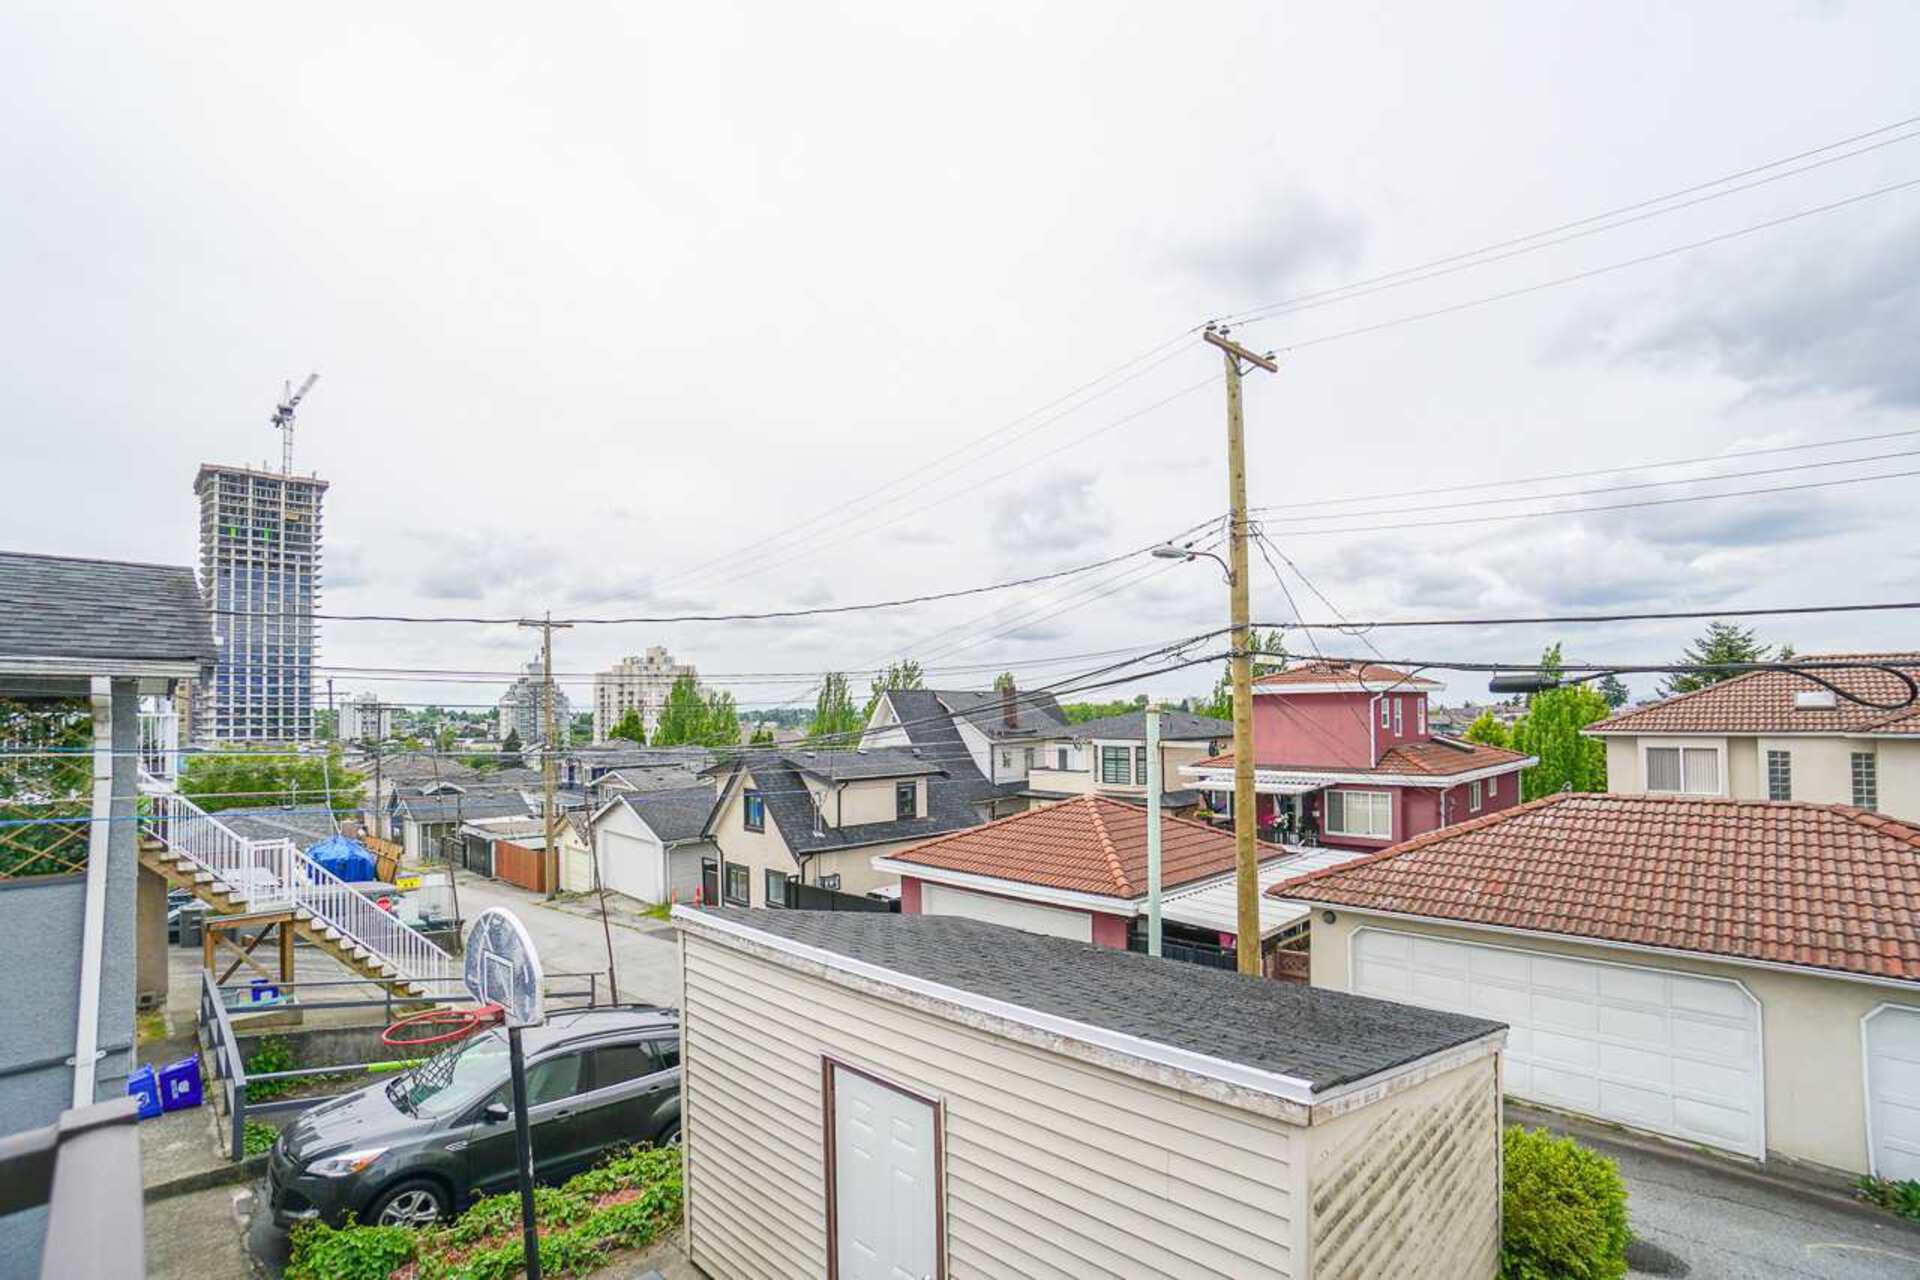 4843-payne-street-collingwood-ve-vancouver-east-37 of 4843 Payne Street, Collingwood VE, Vancouver East